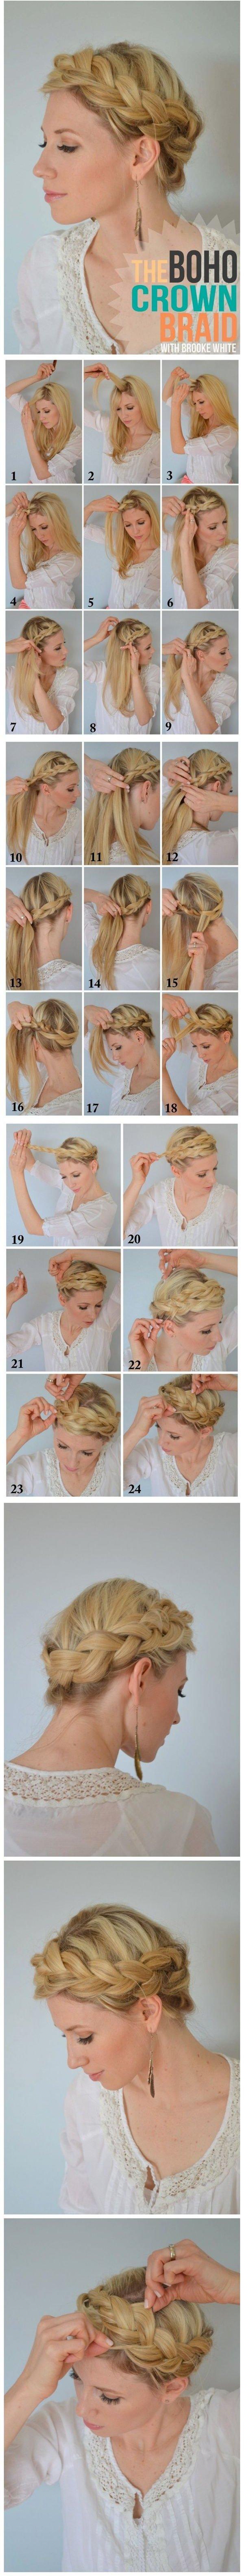 How to Make Boho Crown Braid Tutorial